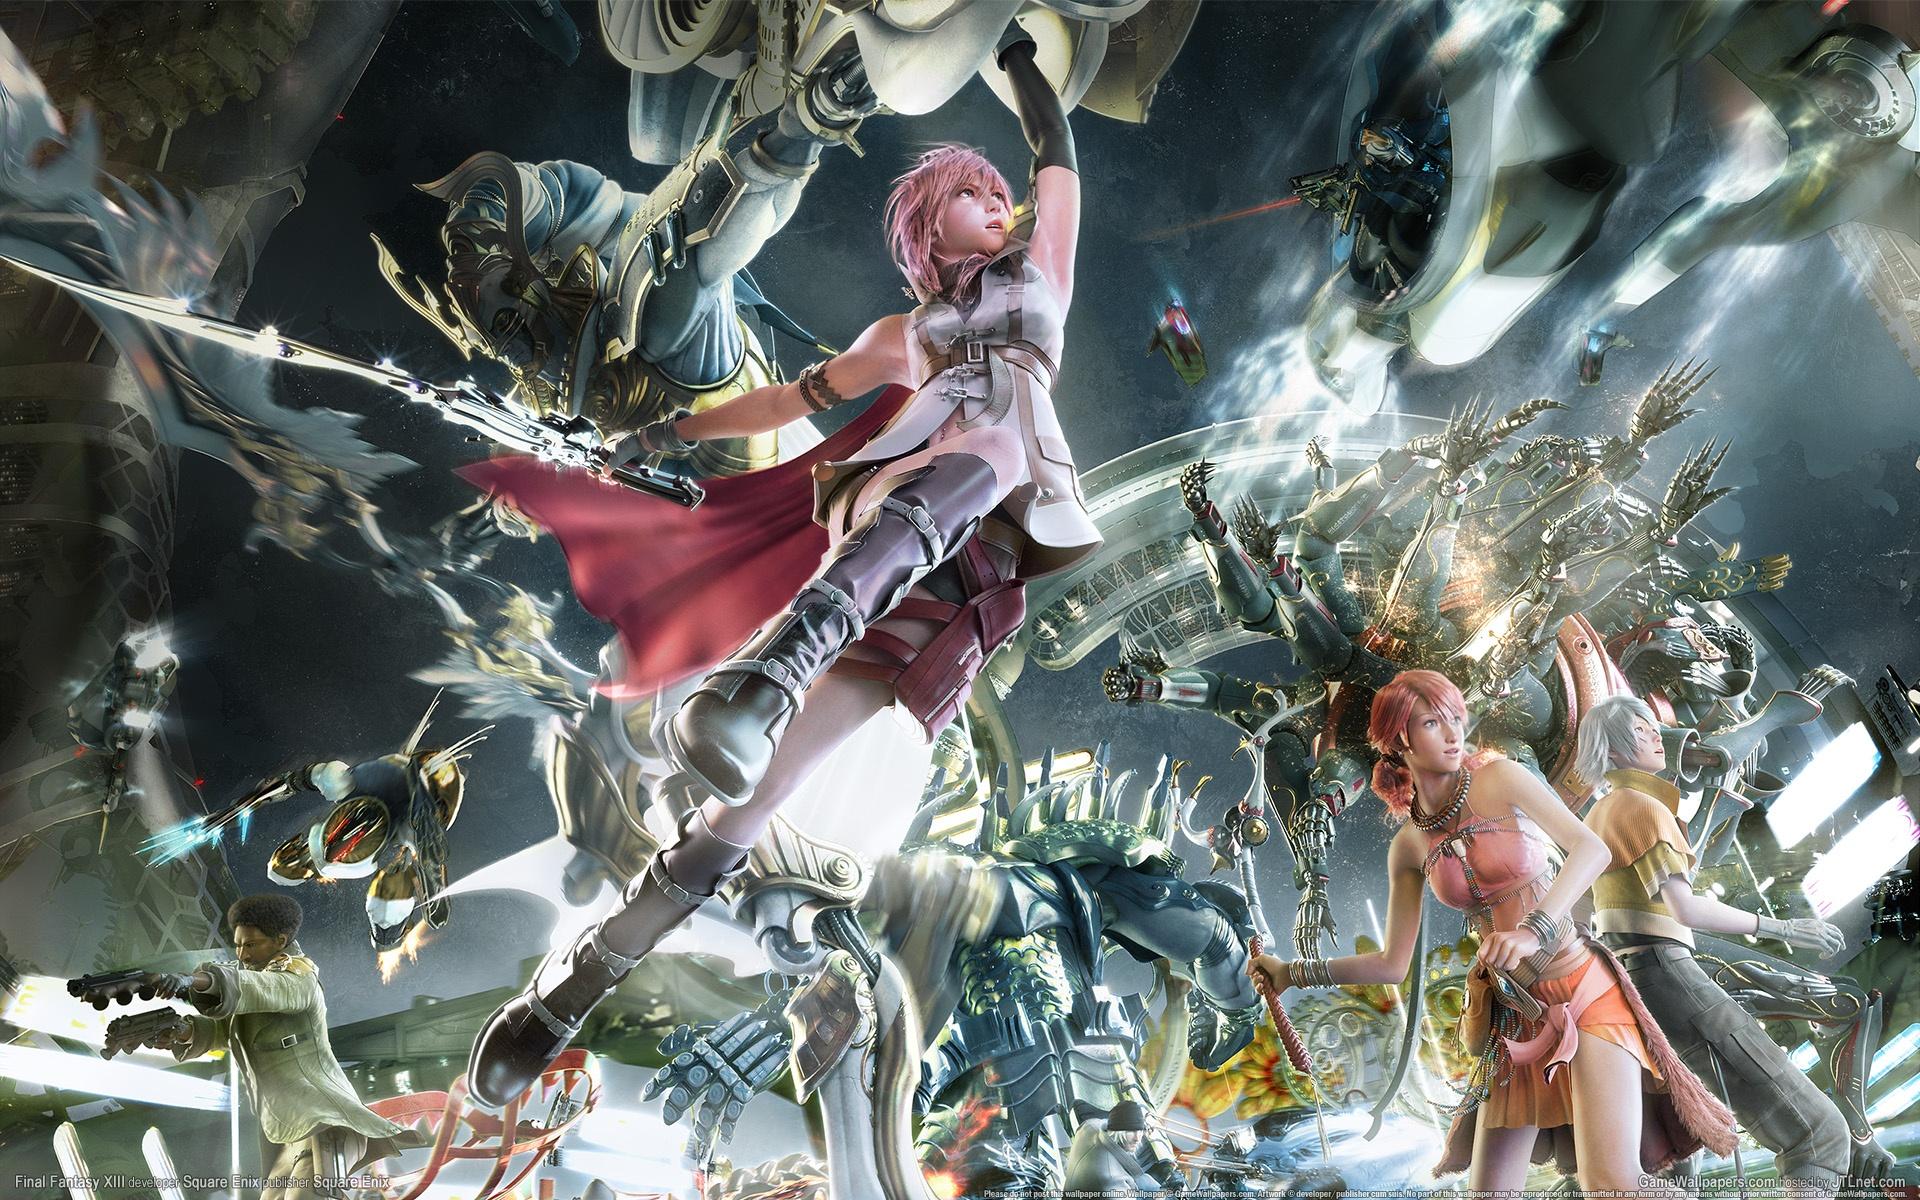 Final Fantasy Xiii 2 Game 3 Hd Wallpaper